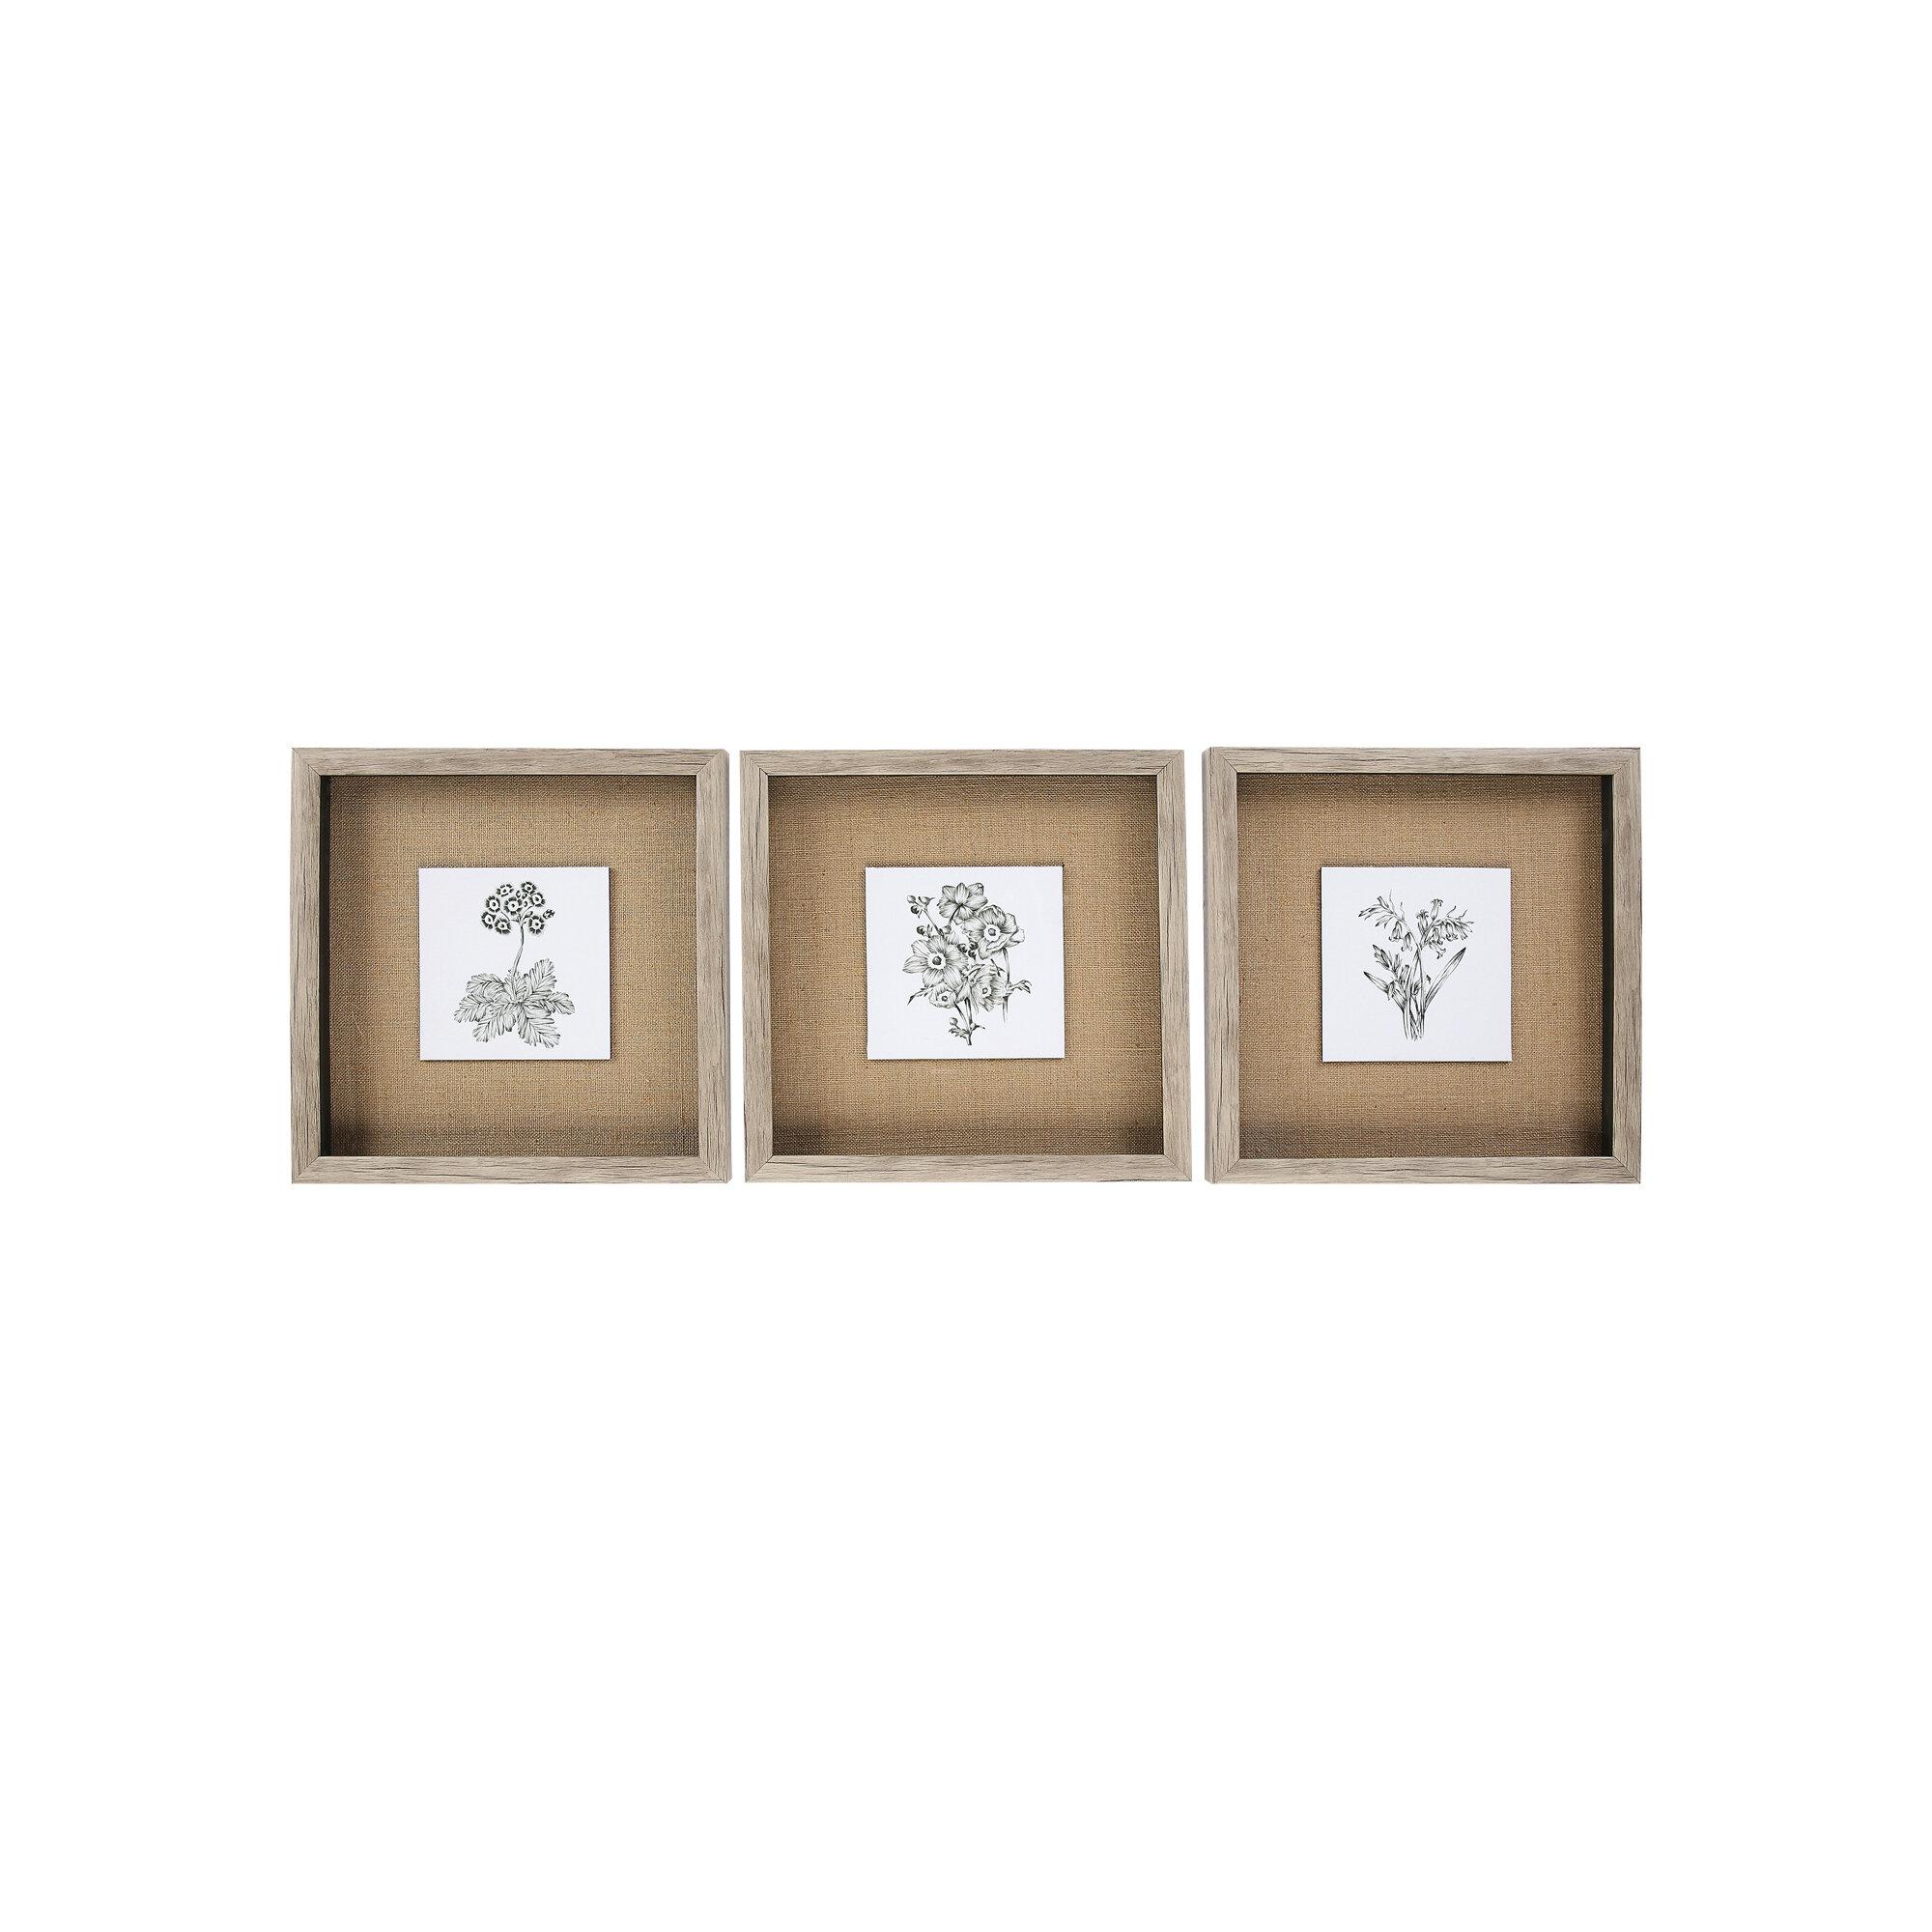 Three Posts Monochrome Botanical 3 Piece Picture Frame Drawing Print Set Reviews Wayfair Co Uk